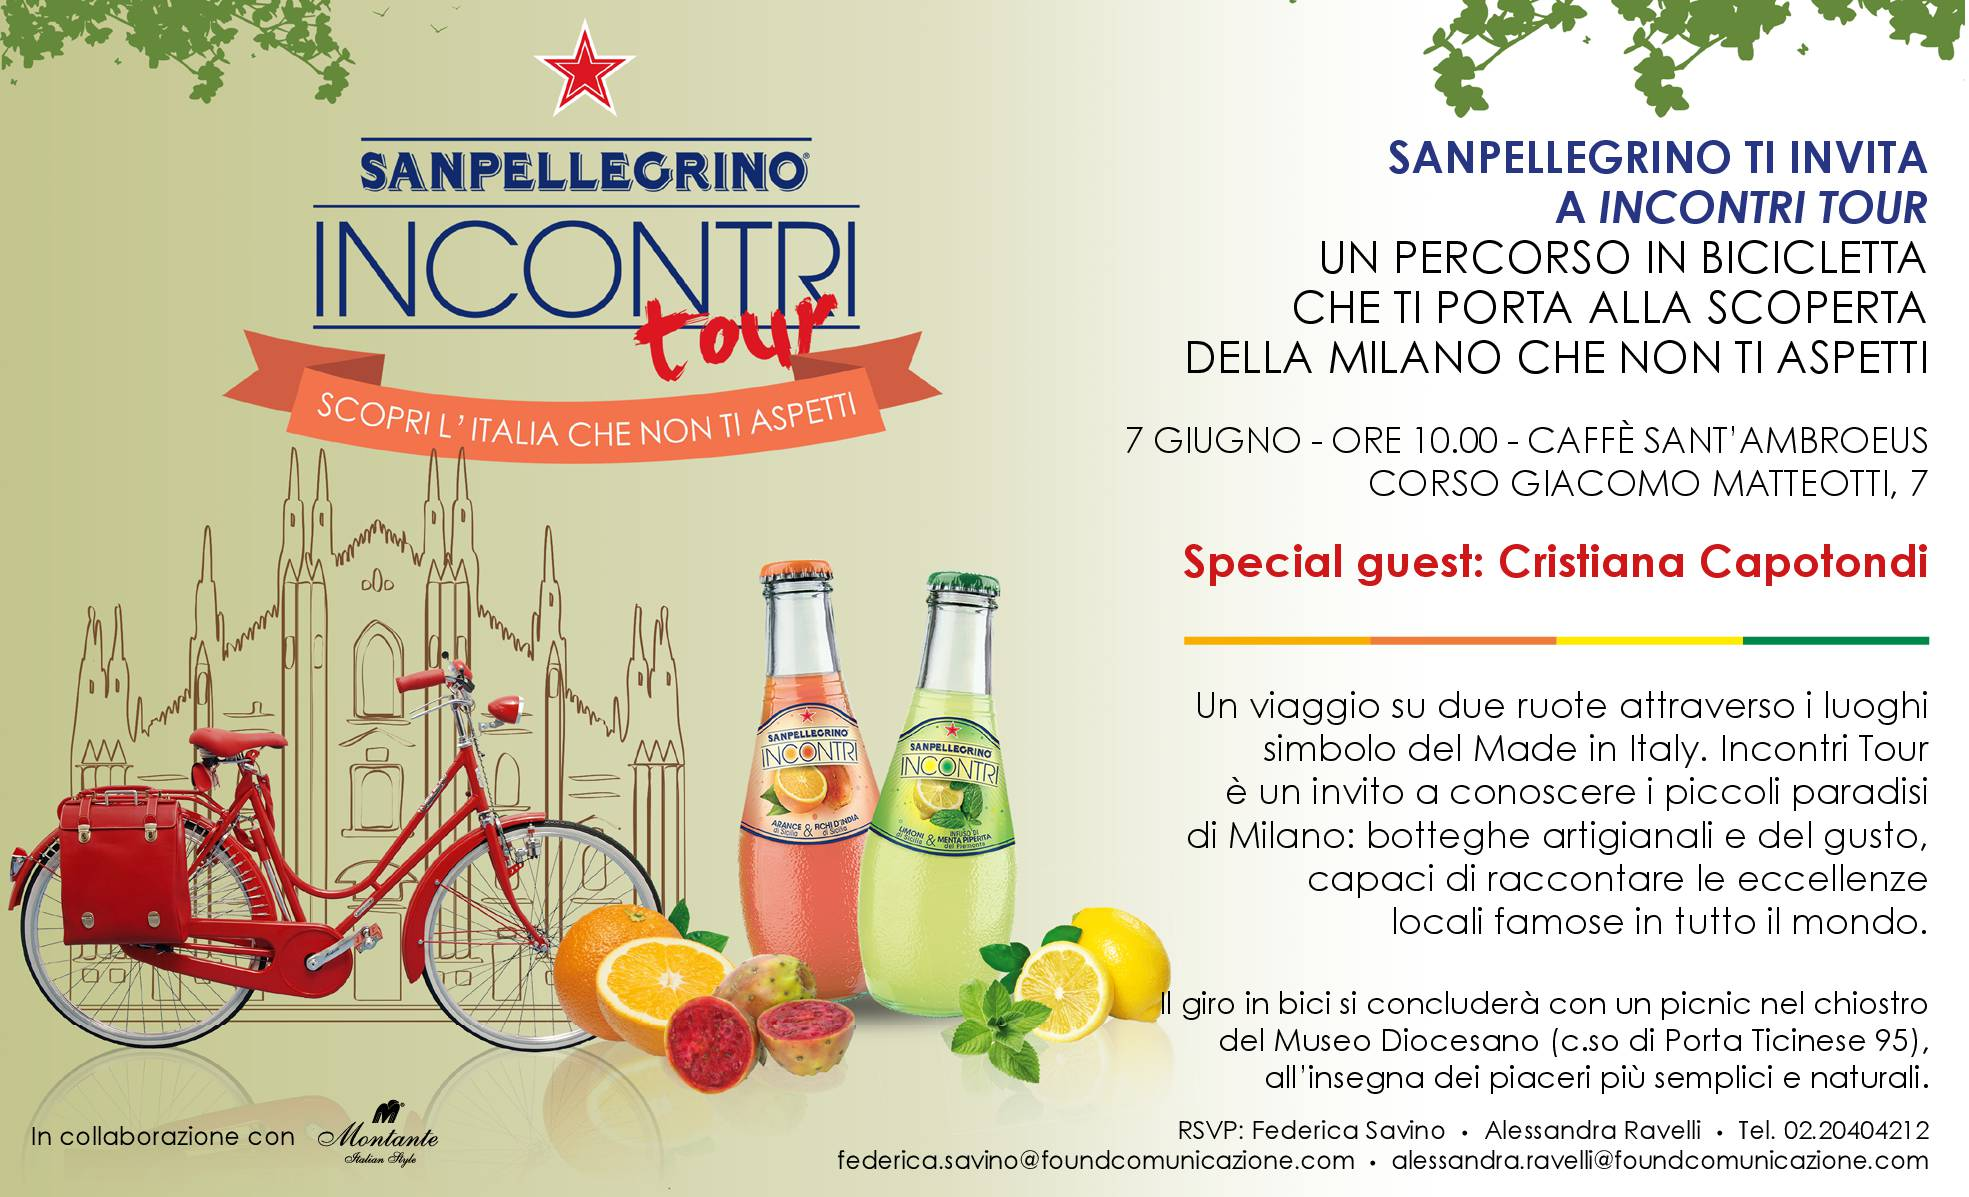 Sanpellegrino Incontri Tour Milano